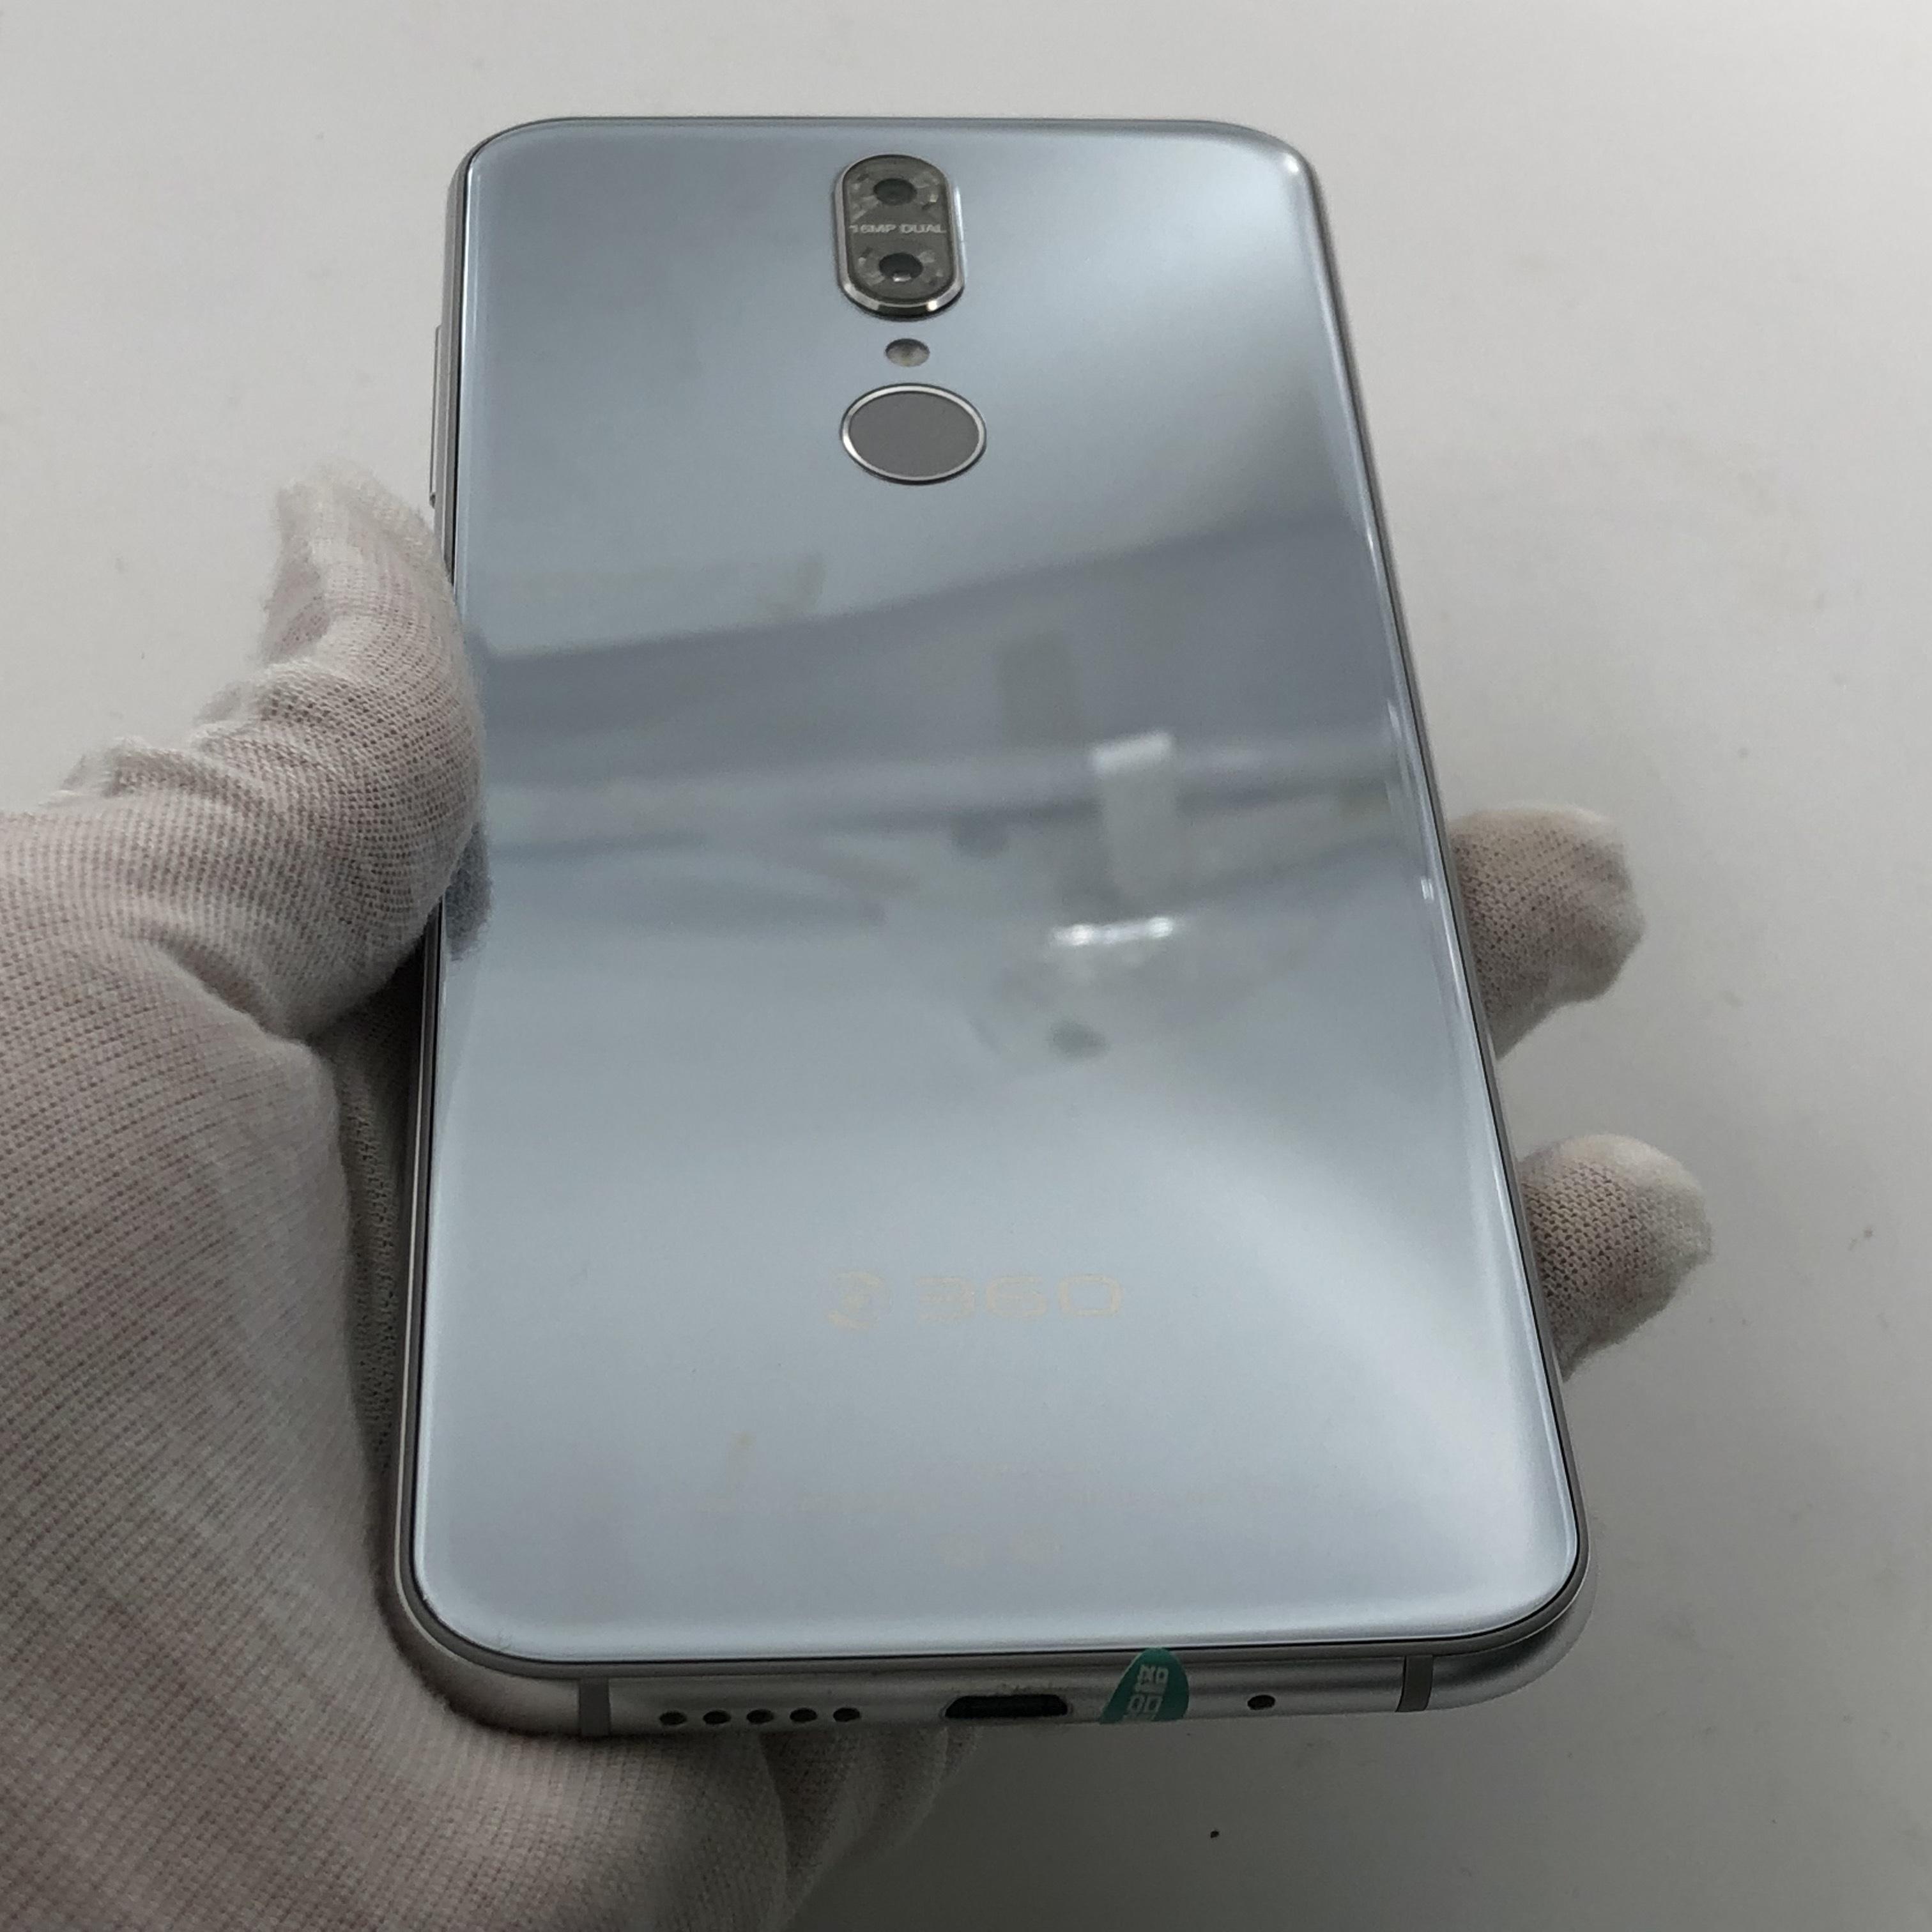 360手机【N6 Pro】4G全网通 银色 6G/128G 国行 95新